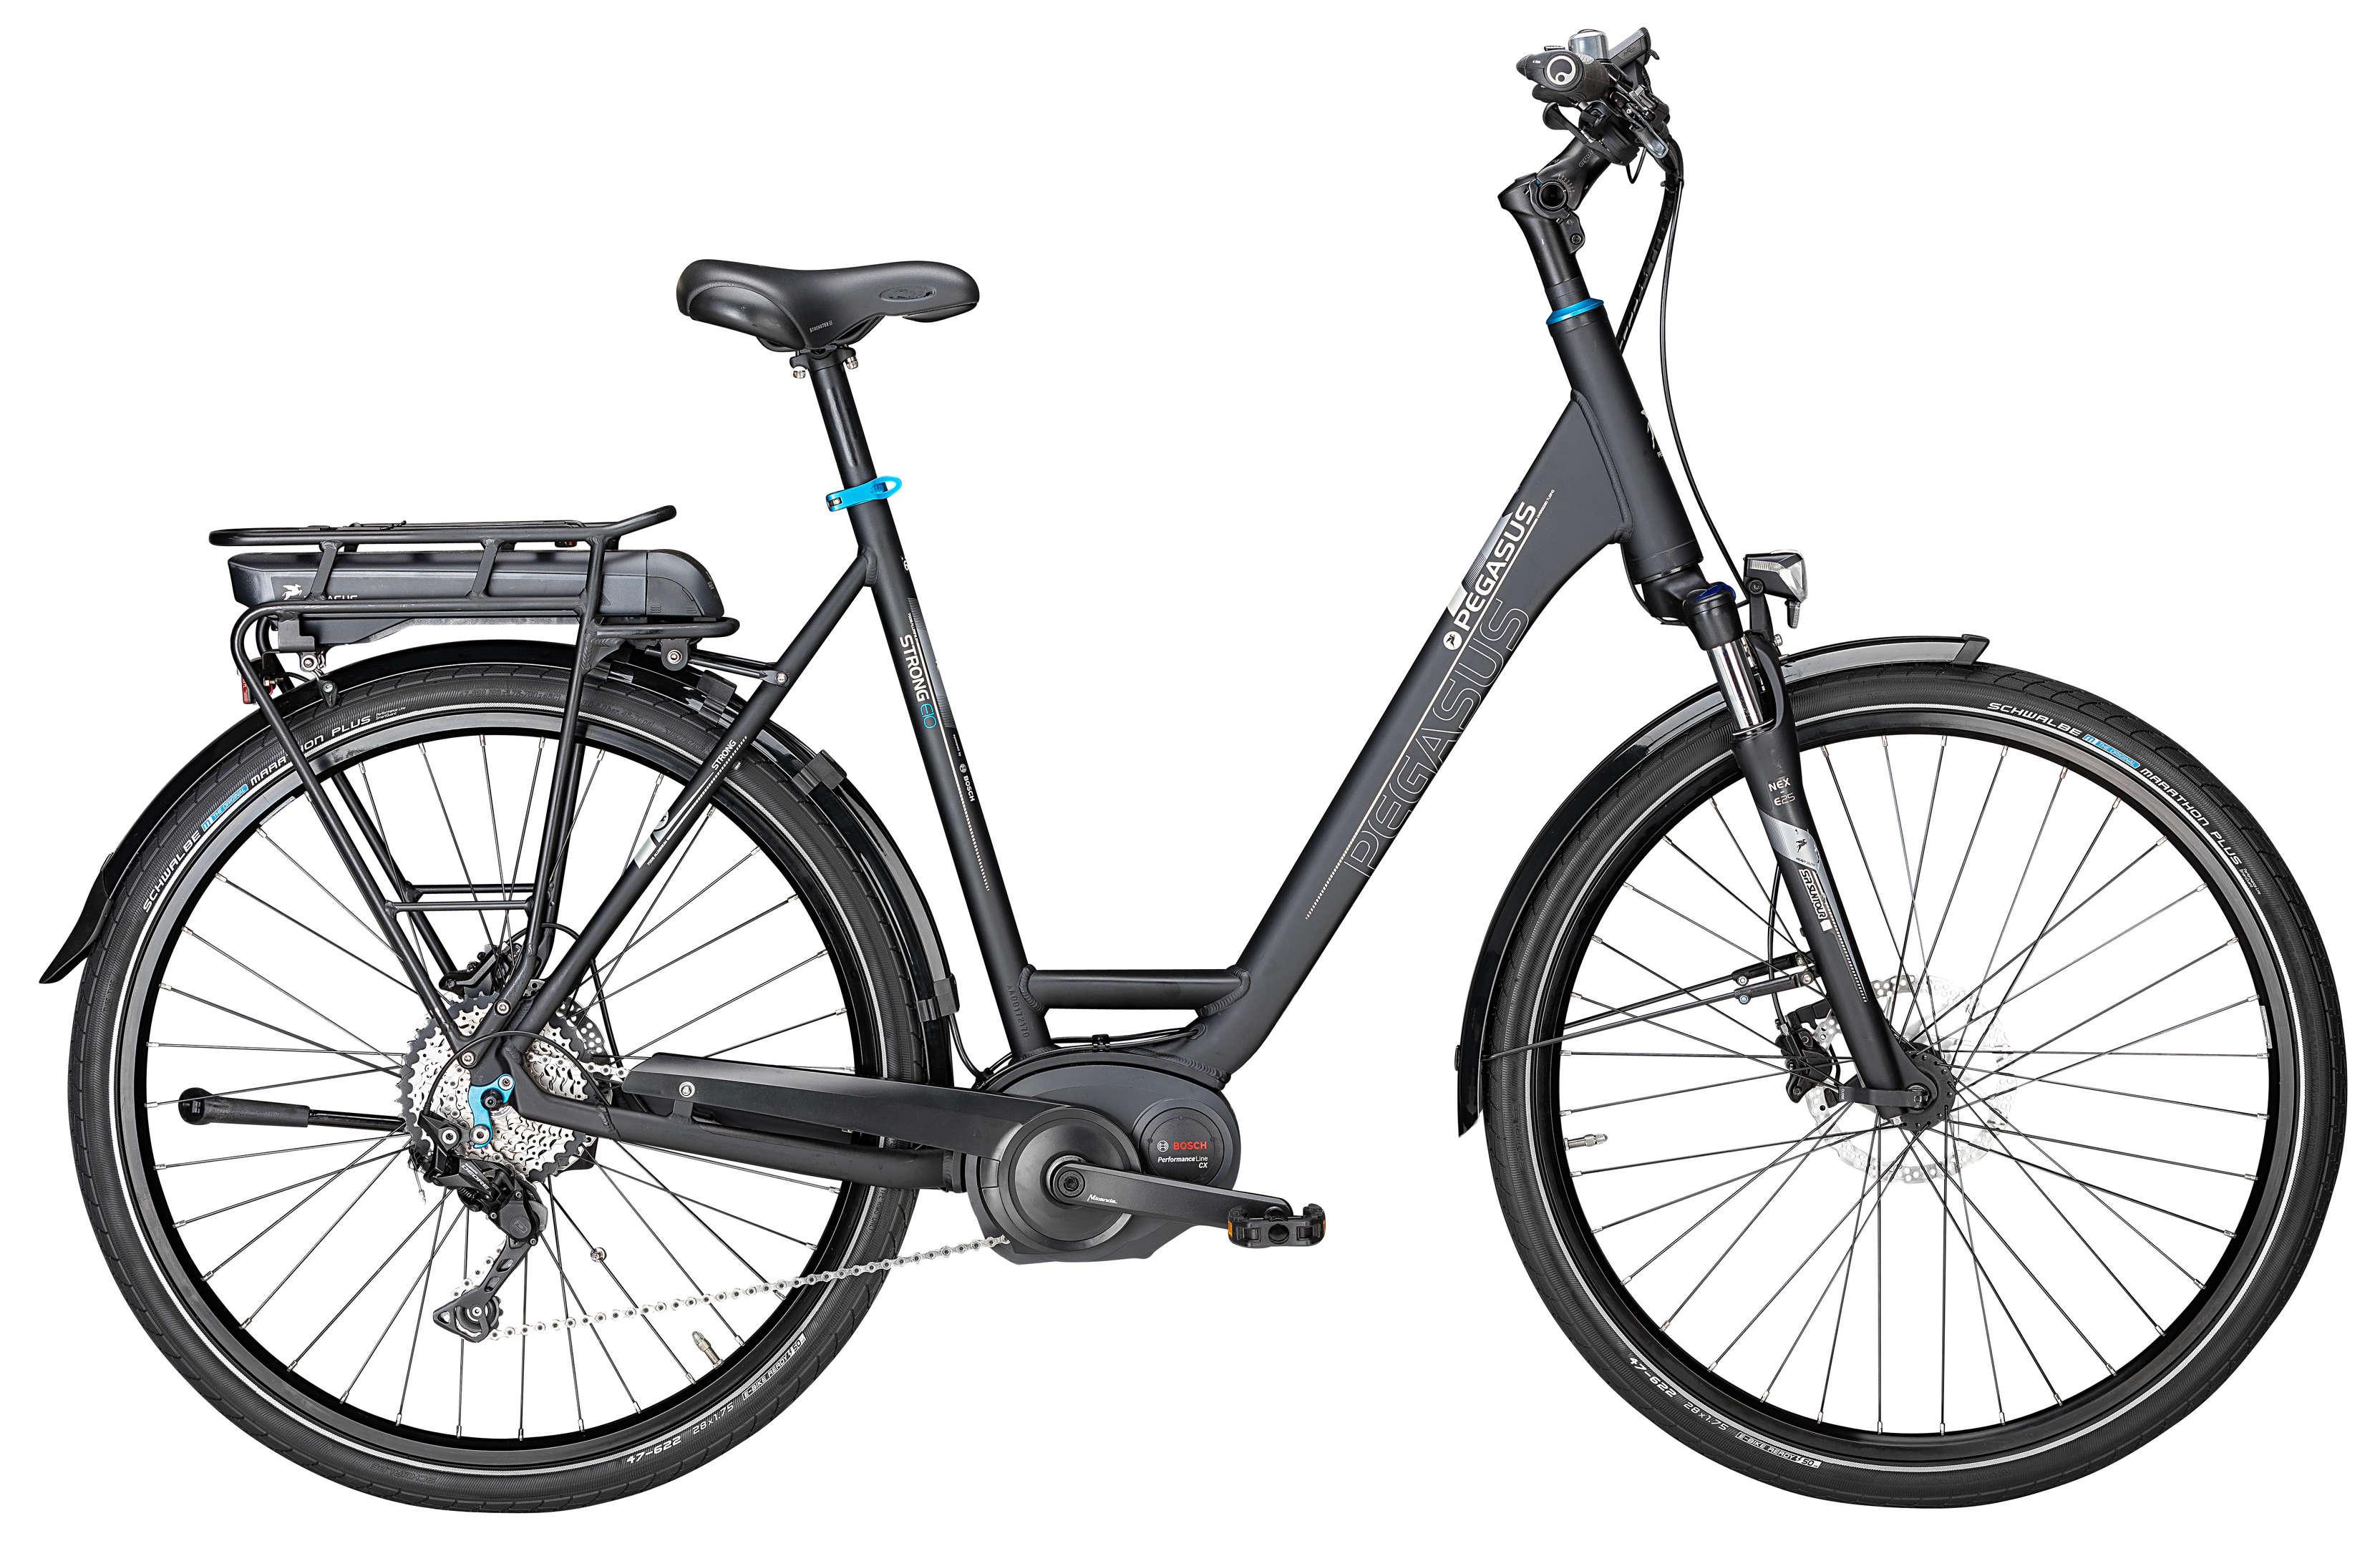 pegasus e bike strong e10 eurorad bikeleasingeurorad. Black Bedroom Furniture Sets. Home Design Ideas